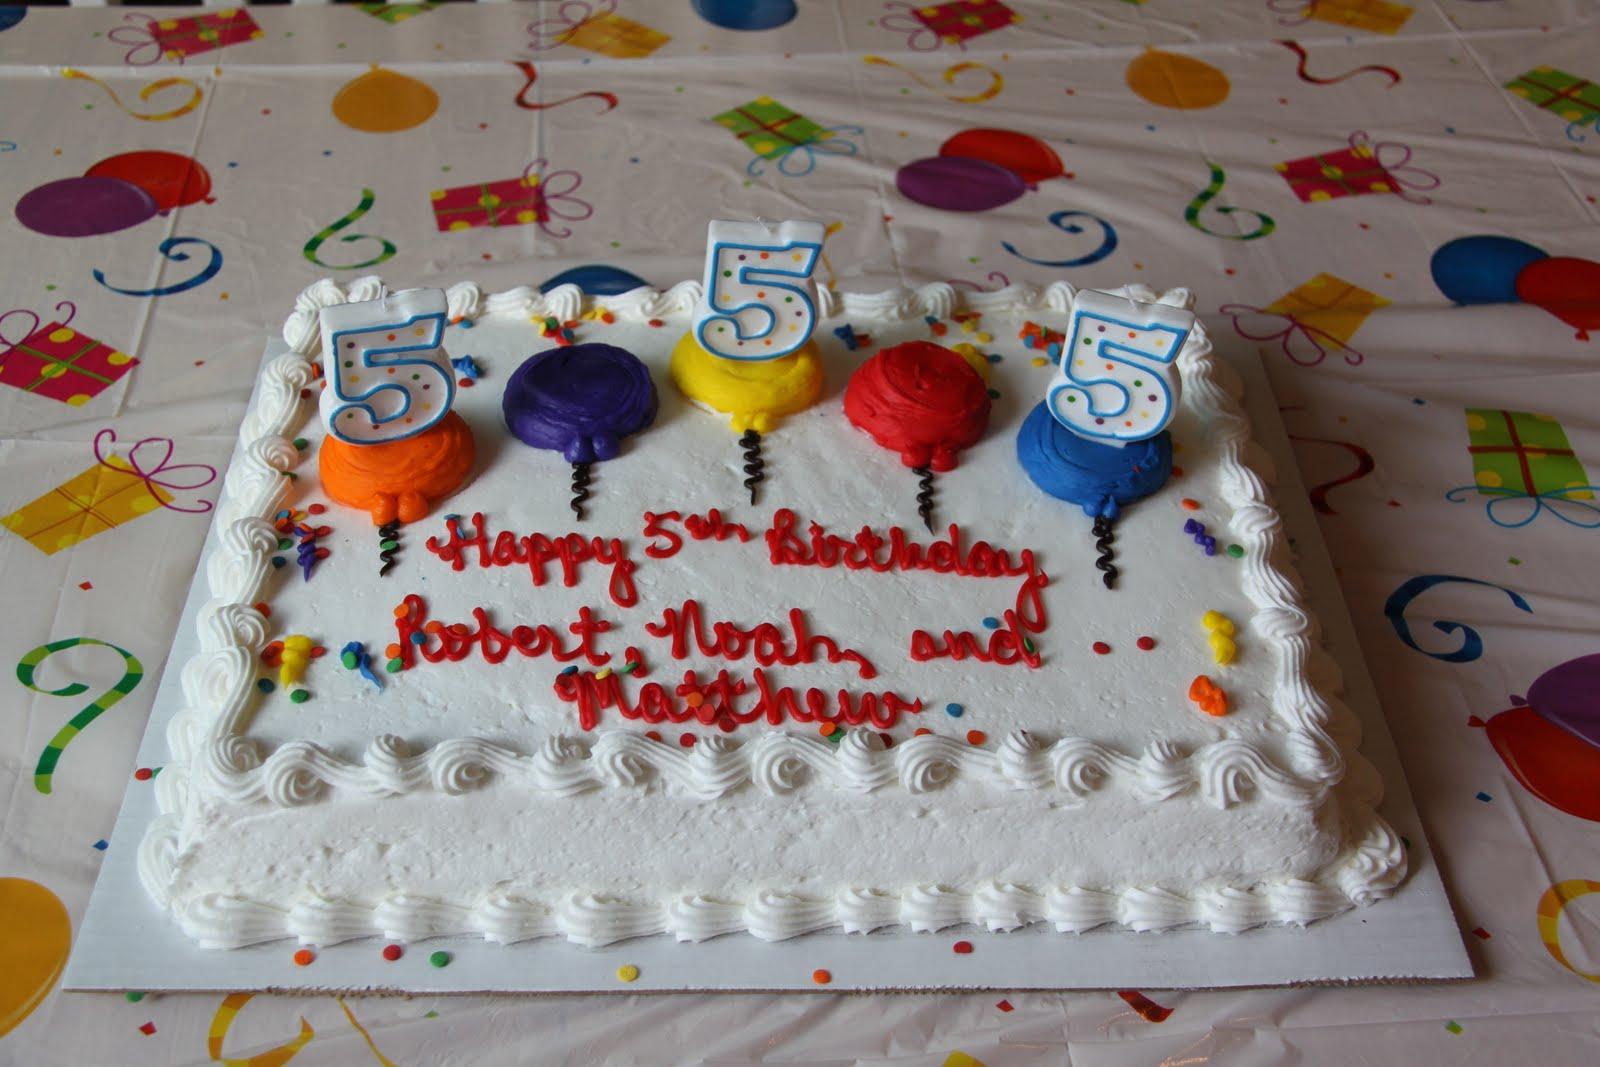 11 Order Costco Birthday Cakes Photo Costco Cake Designs Order